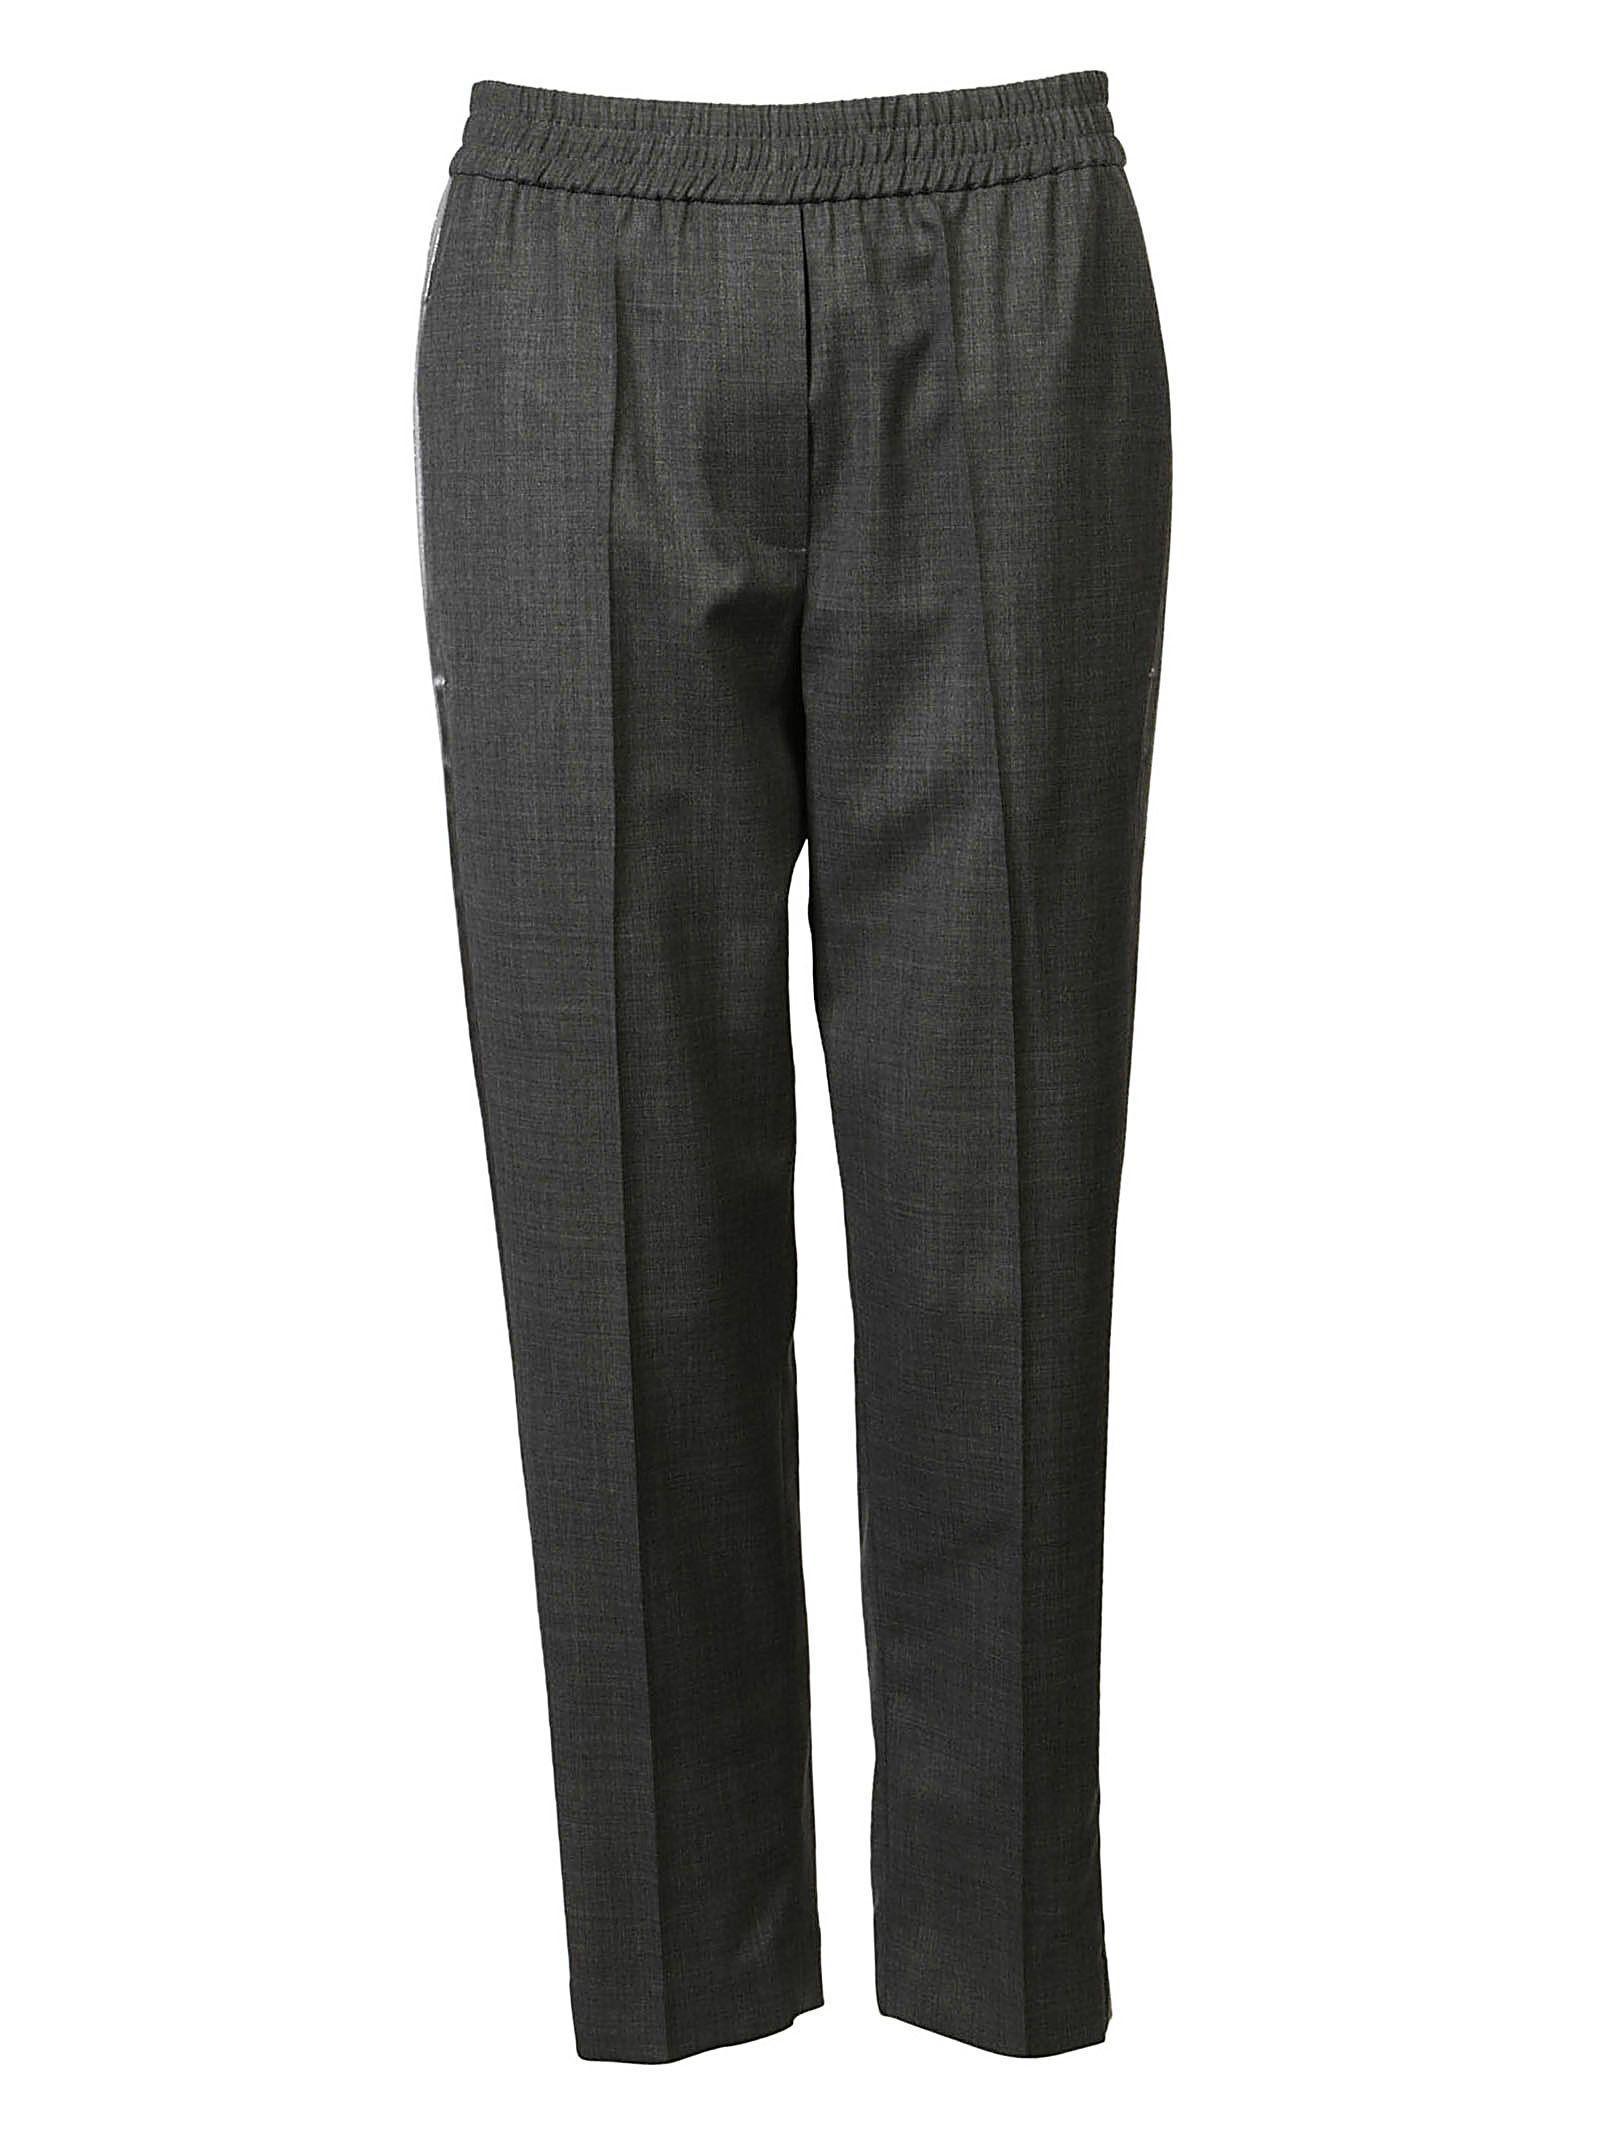 Brunello Cucinelli Elasticated Trousers In Grigio